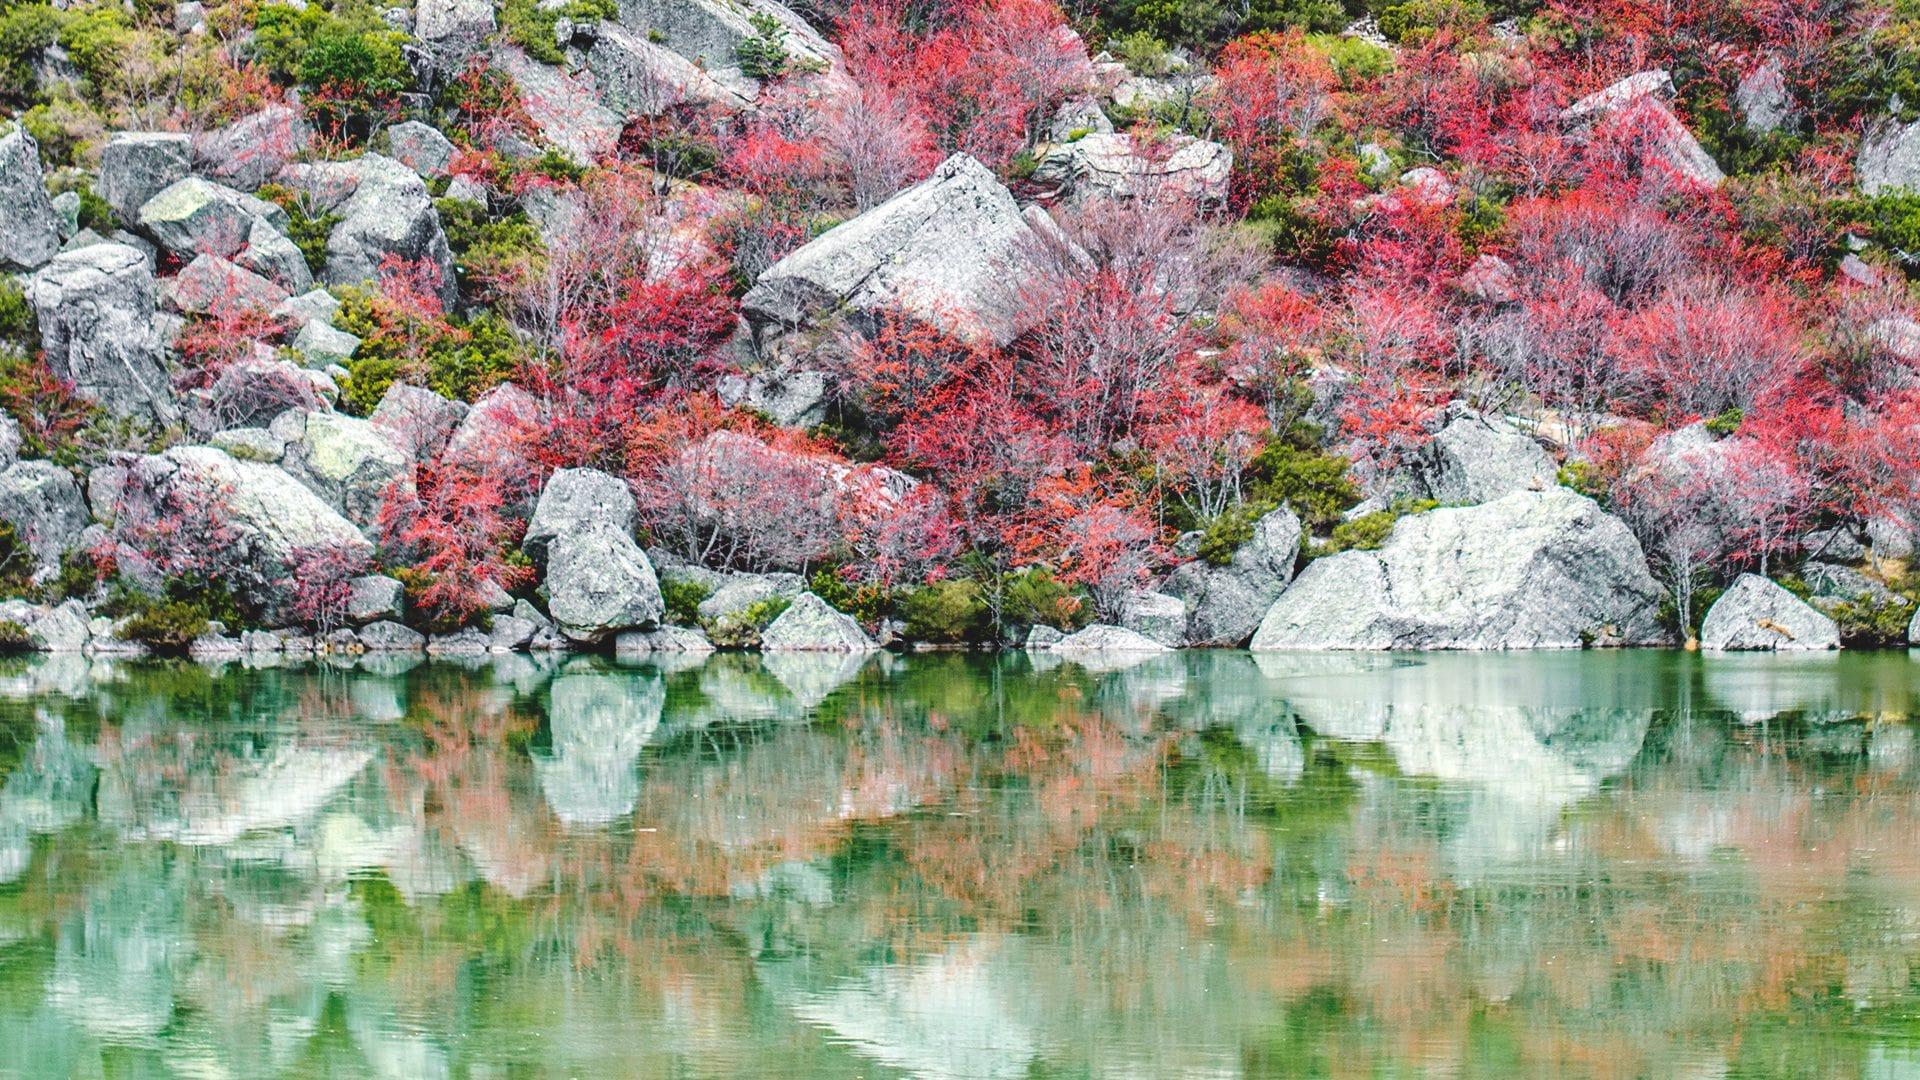 Laguna Negra en Soria | Rojo Cangrejo Blog de Viajes